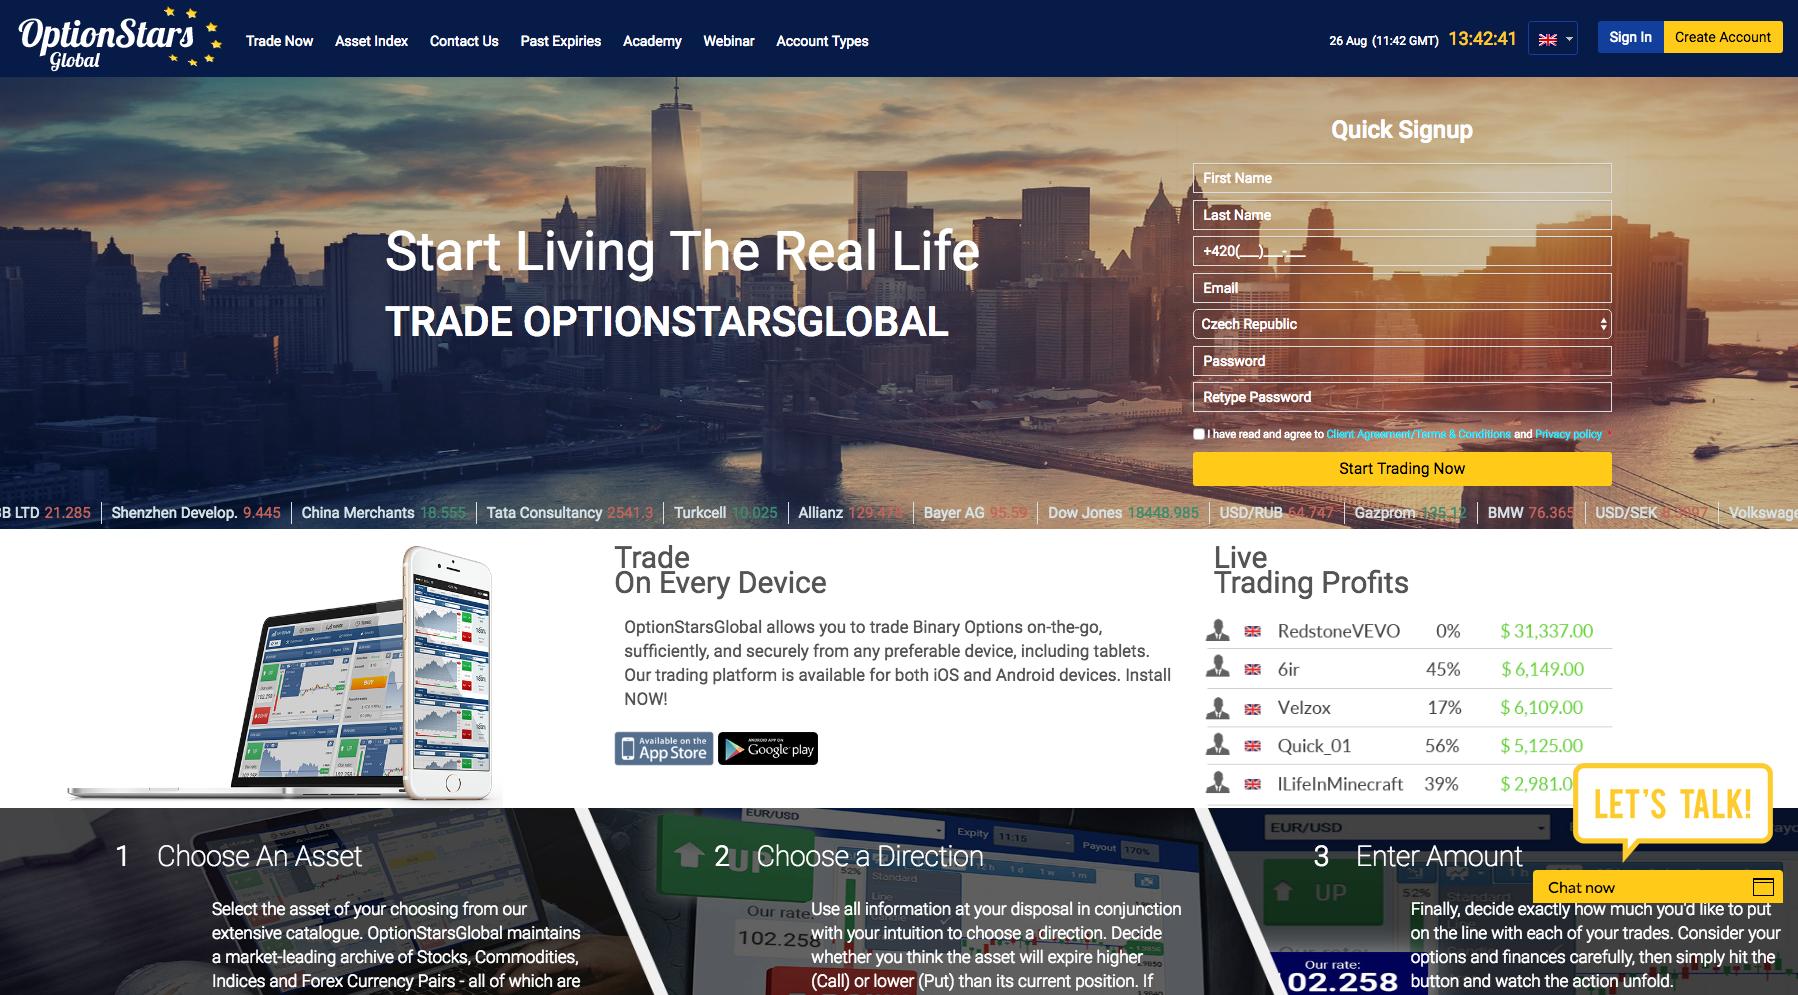 Option Stars Global